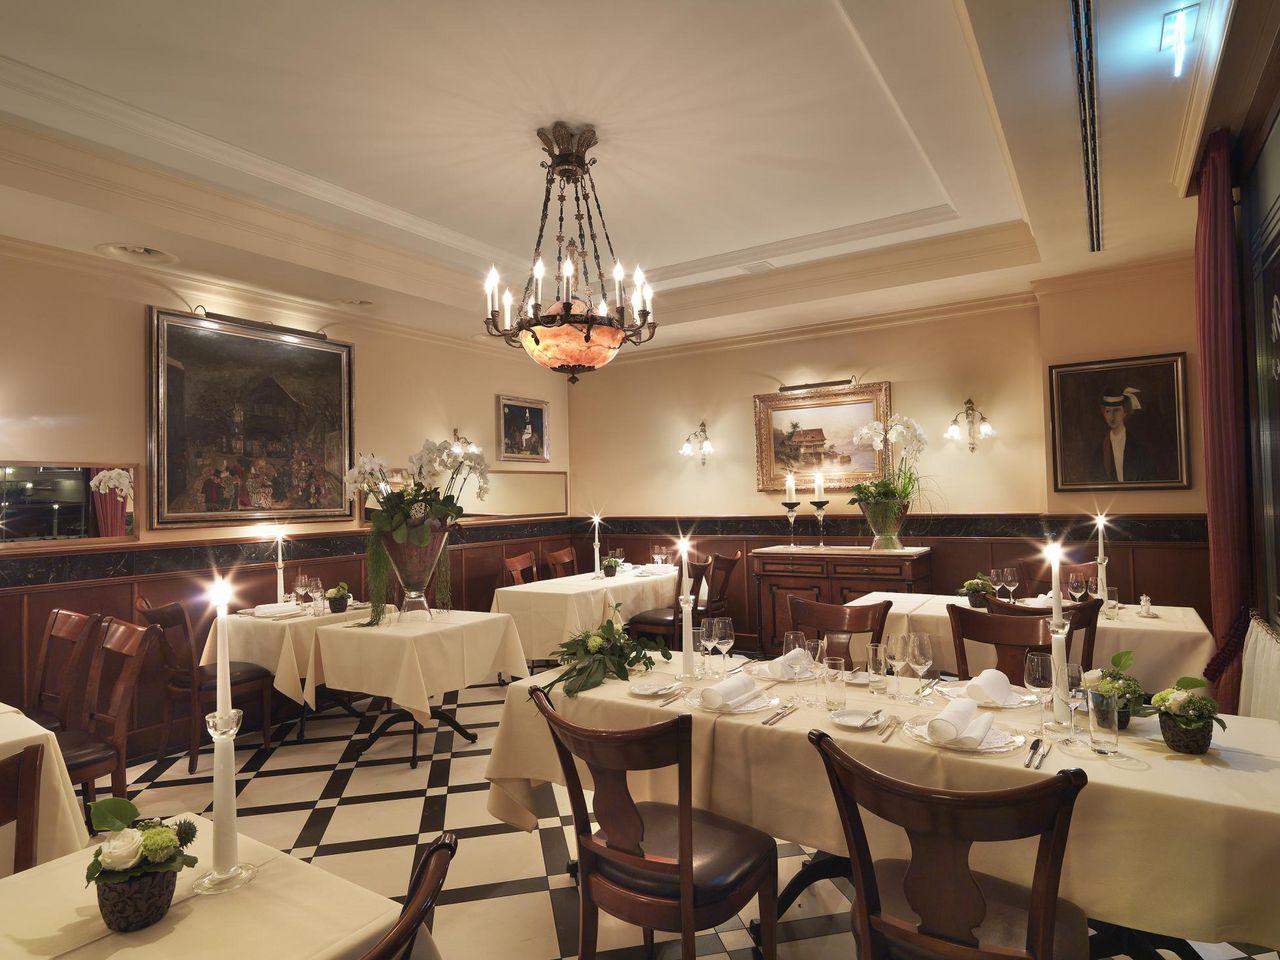 Le Mirage Brasserie, Stans